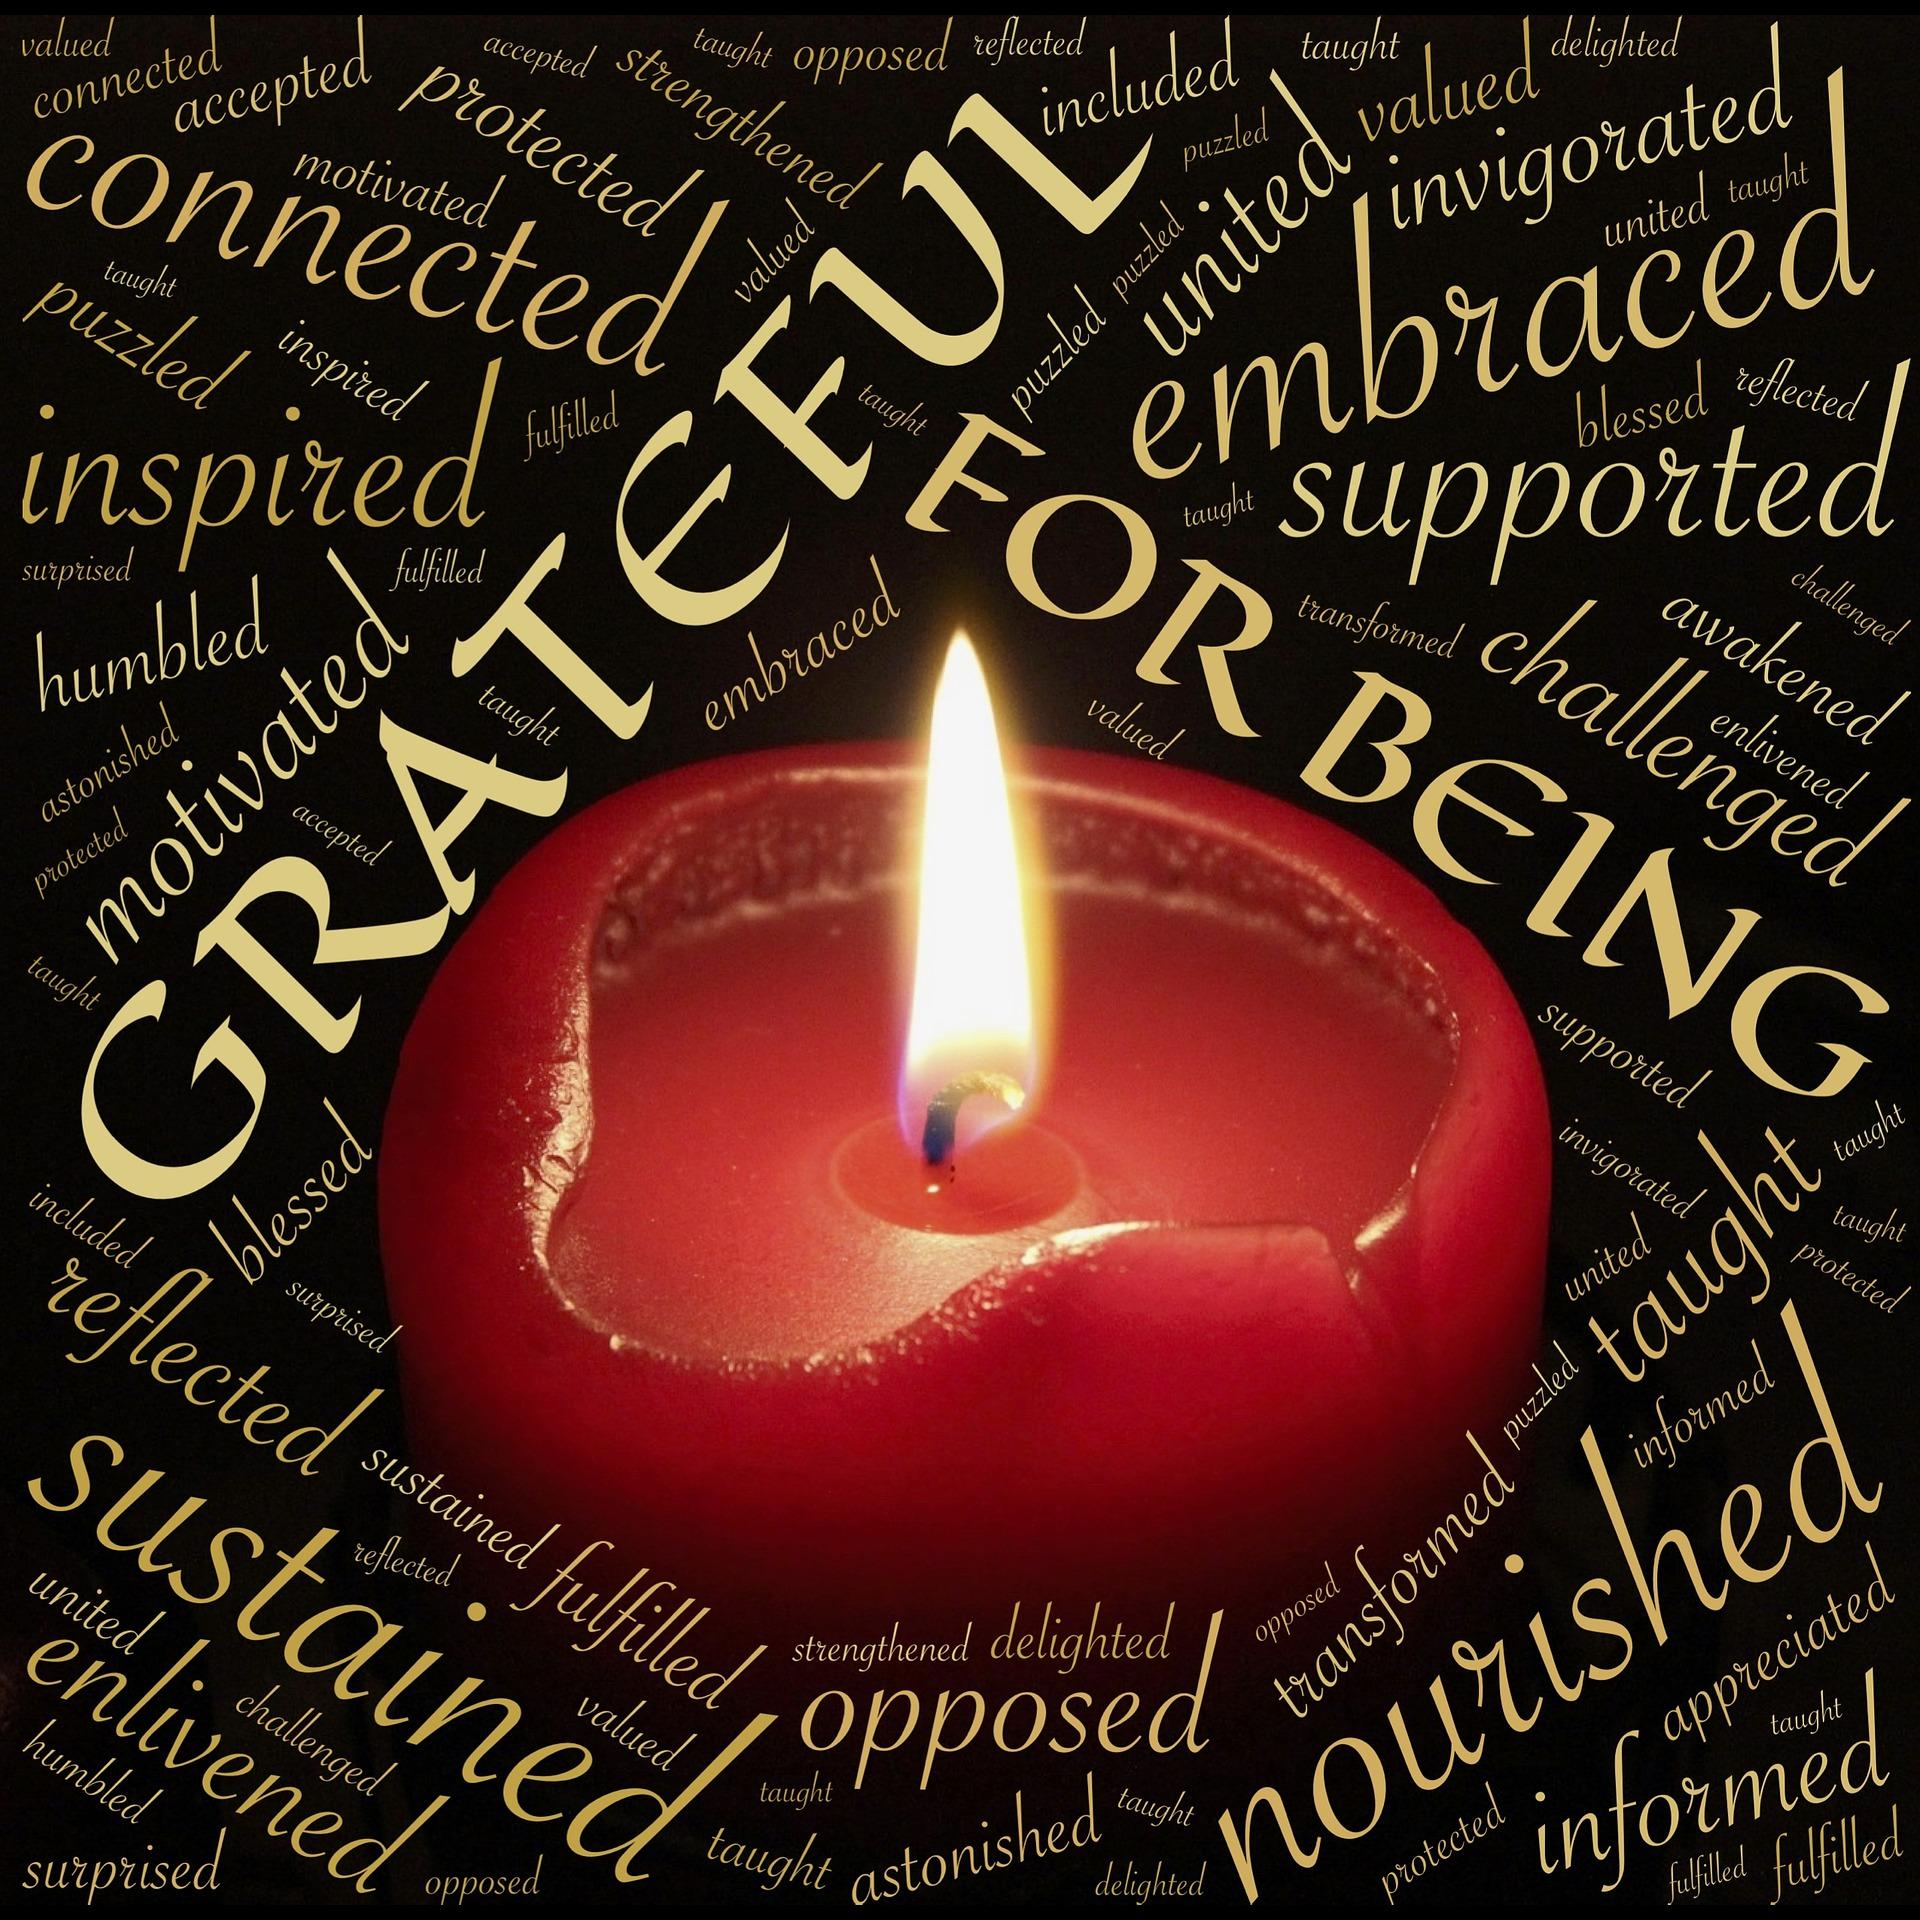 grateful-2940466_1920.jpg